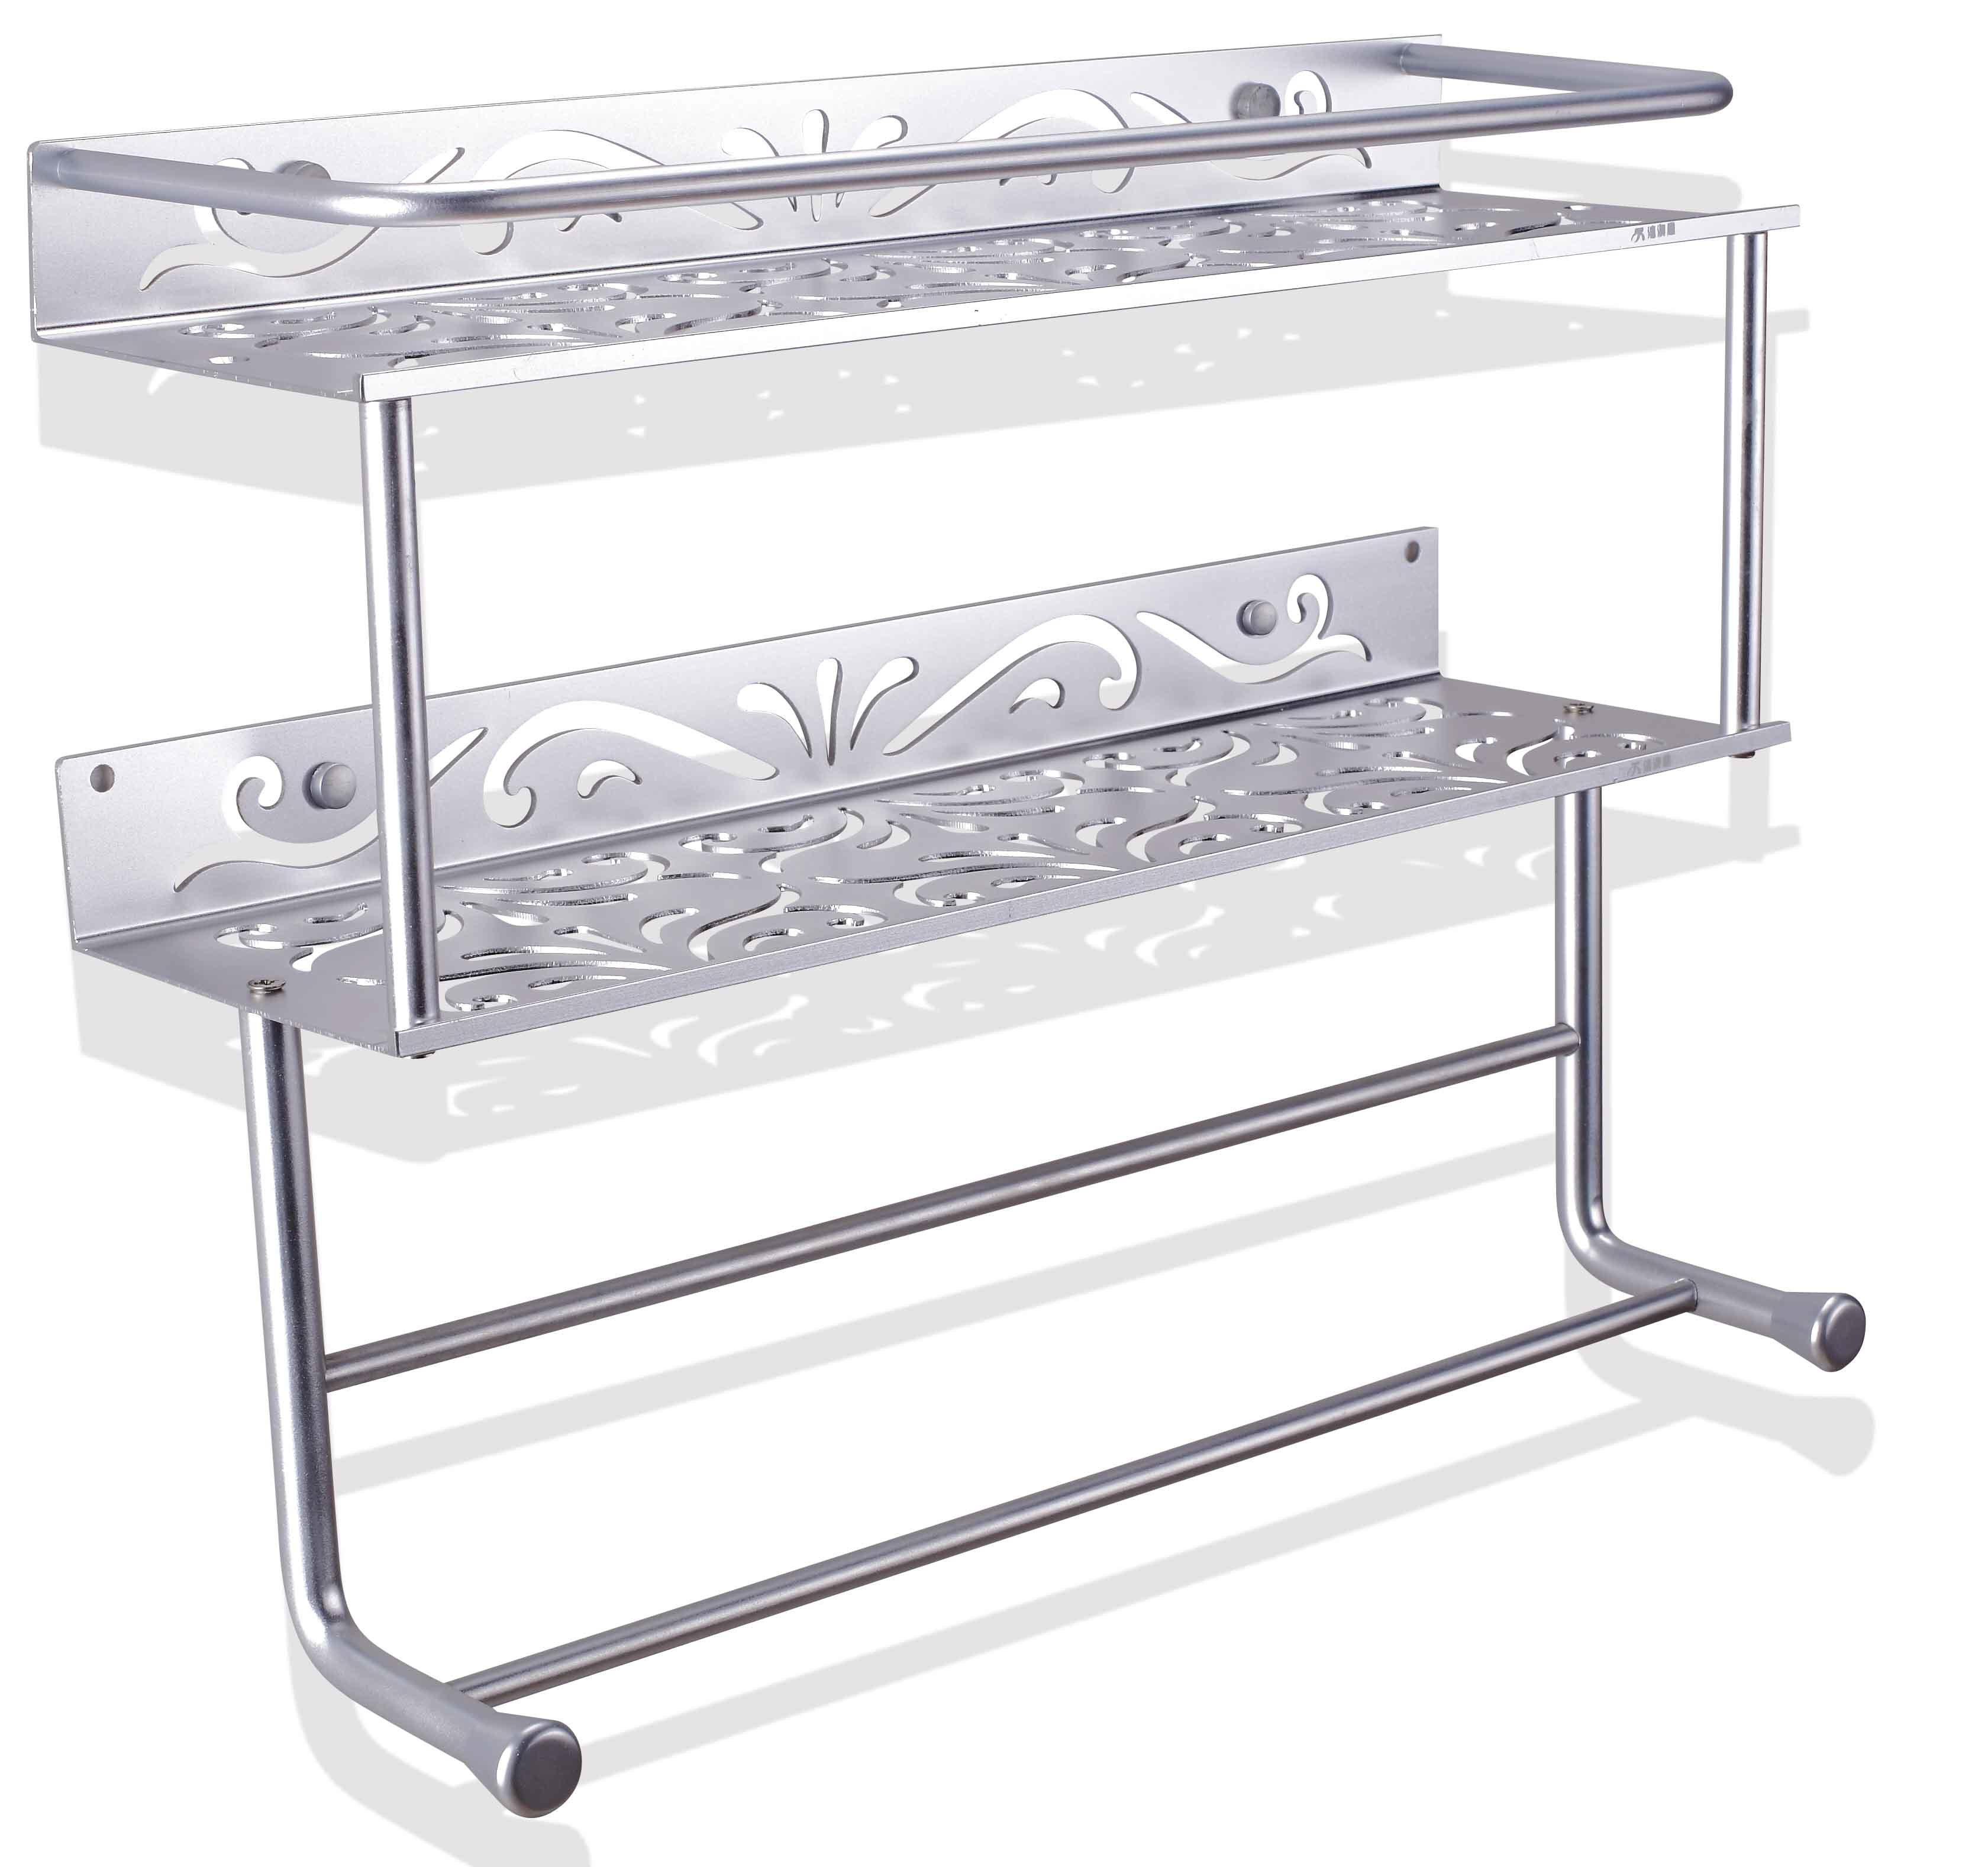 china bathroom shelf basket wire rack jp 10 0004 china shower